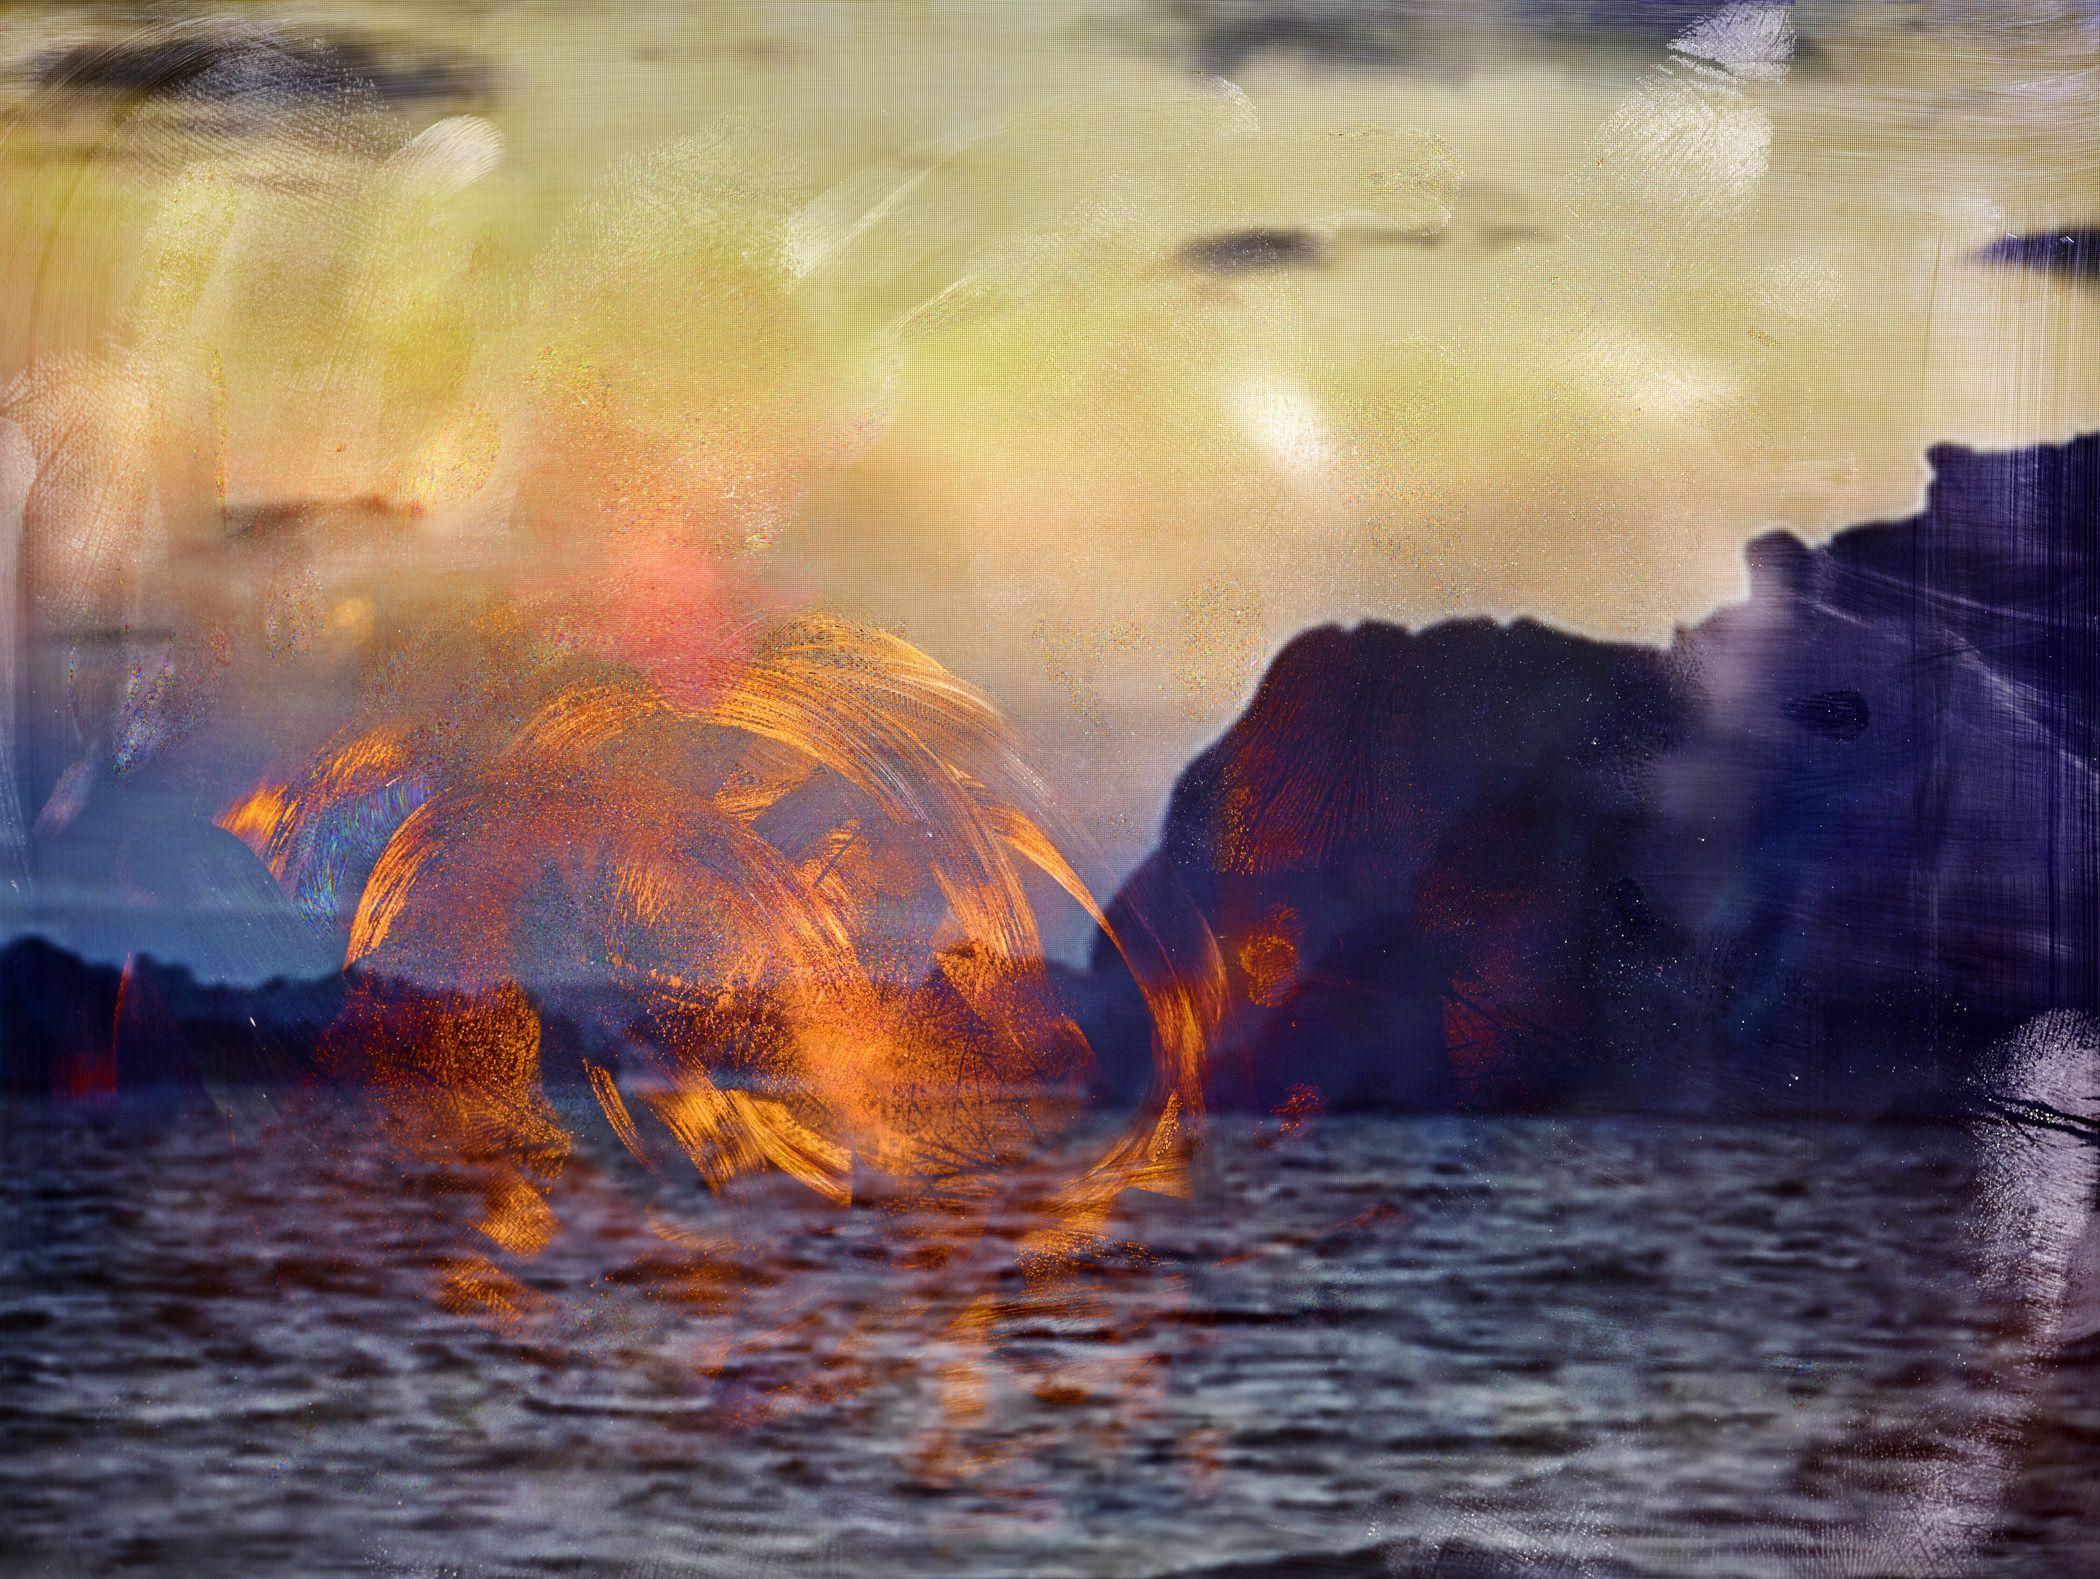 """Greenland Shrinking,""by Tabitha Soren."